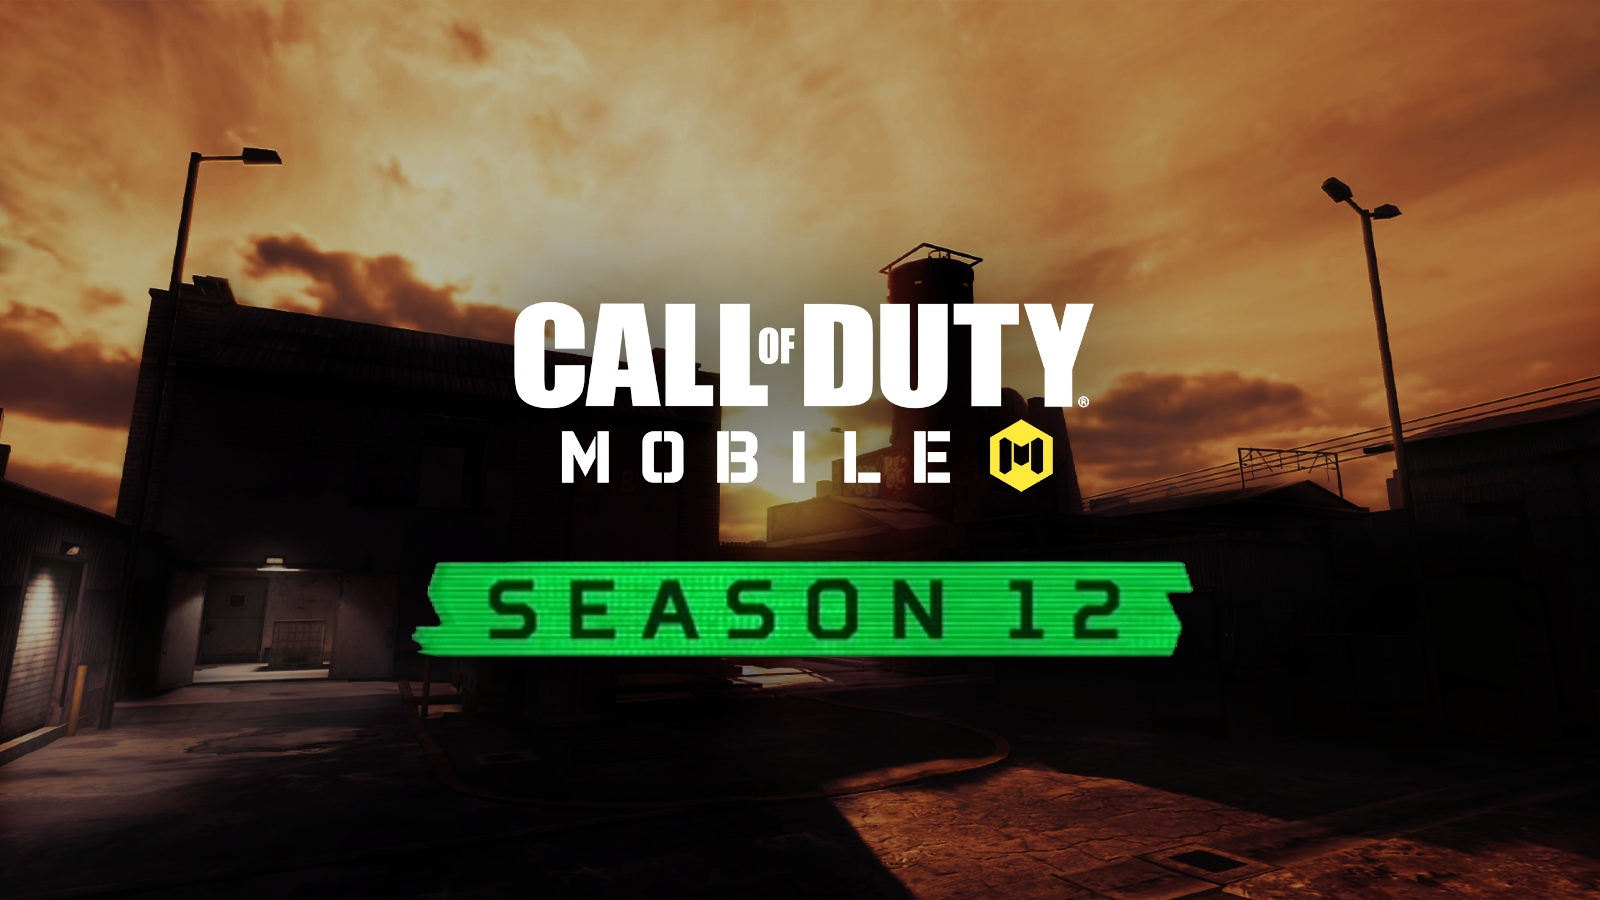 cod-mobile-season-12-date-info-revealed